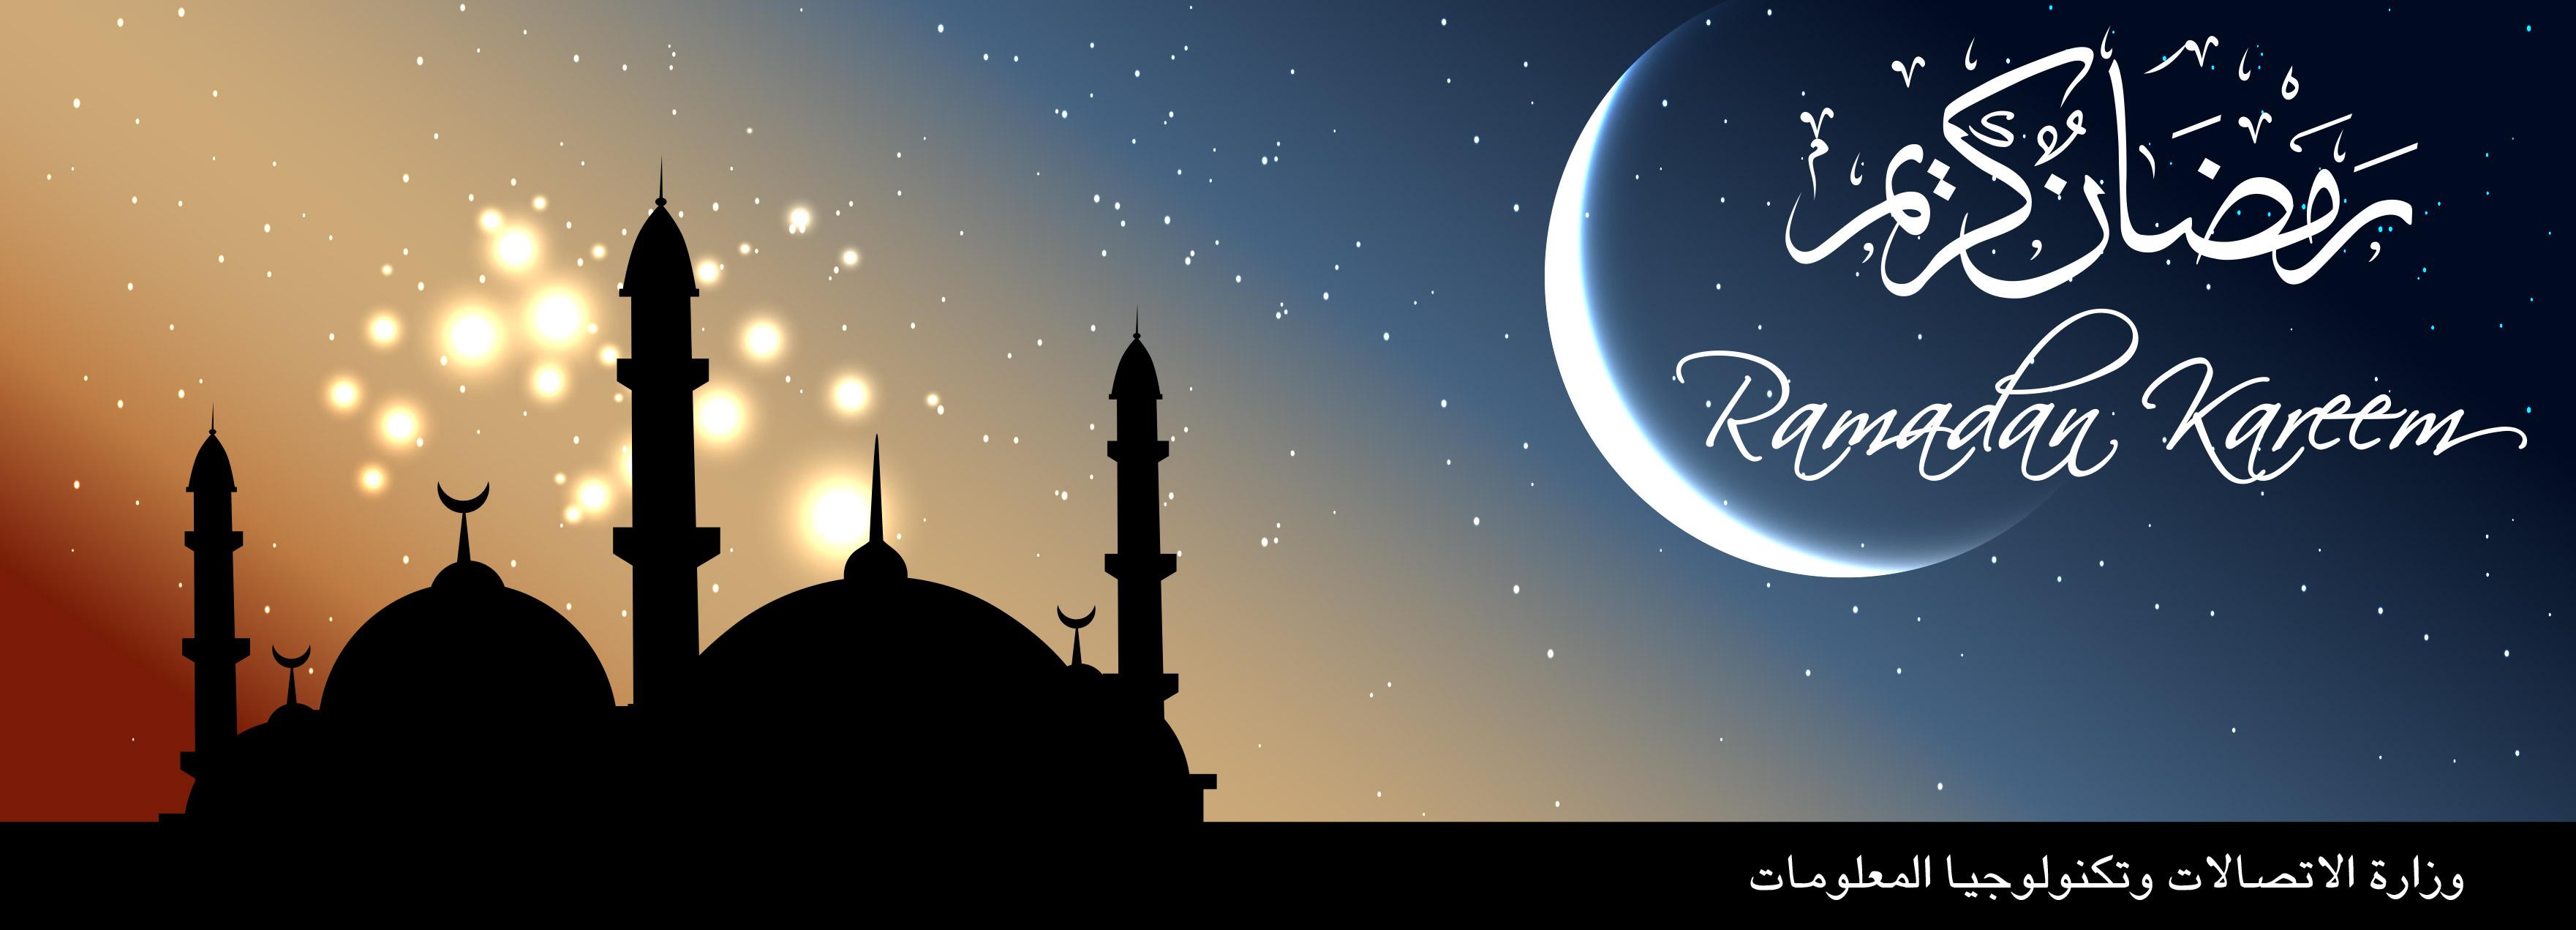 quotes ramadan images